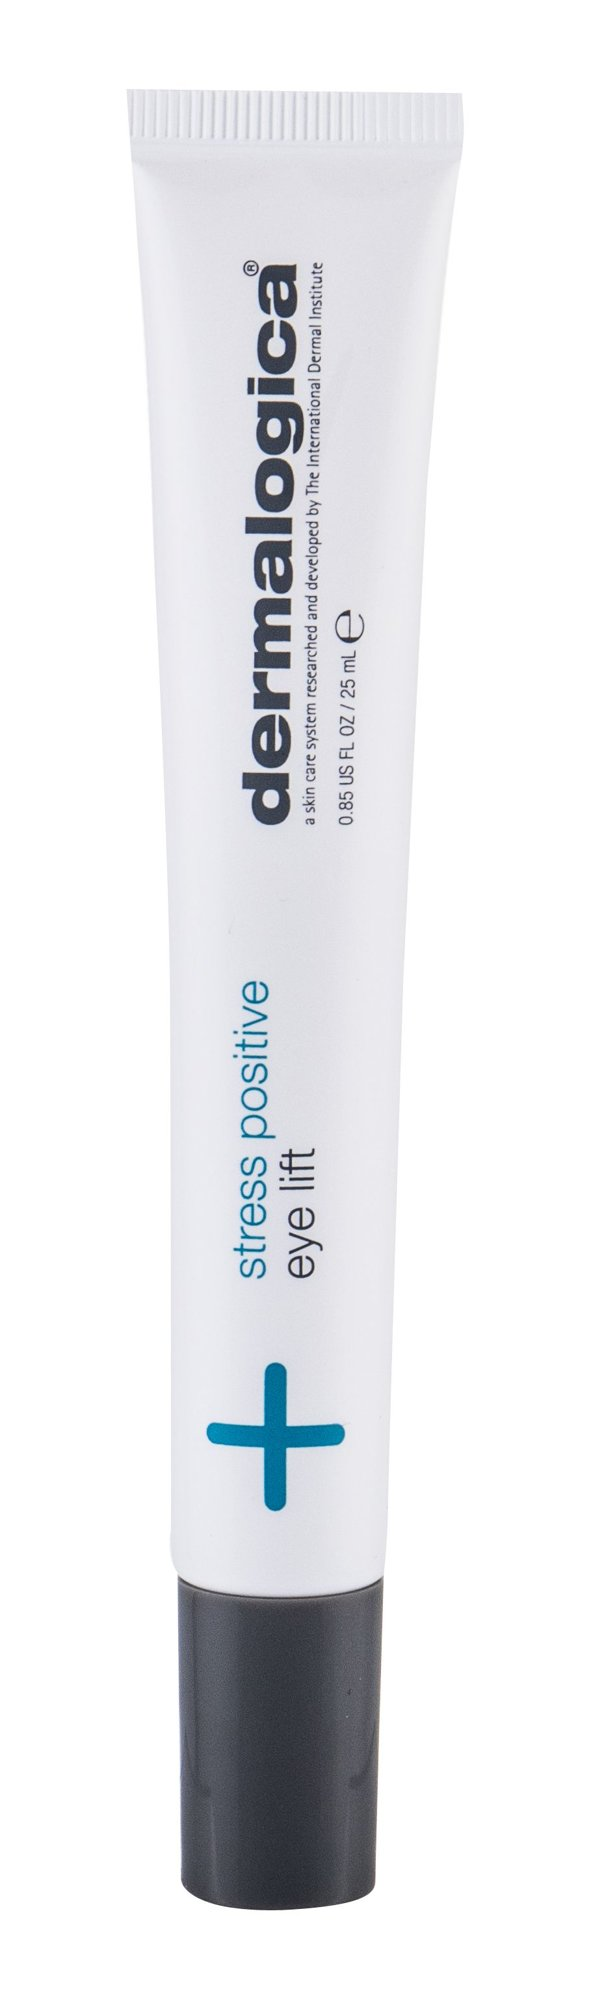 Dermalogica Daily Skin Health Eye Cream 25ml